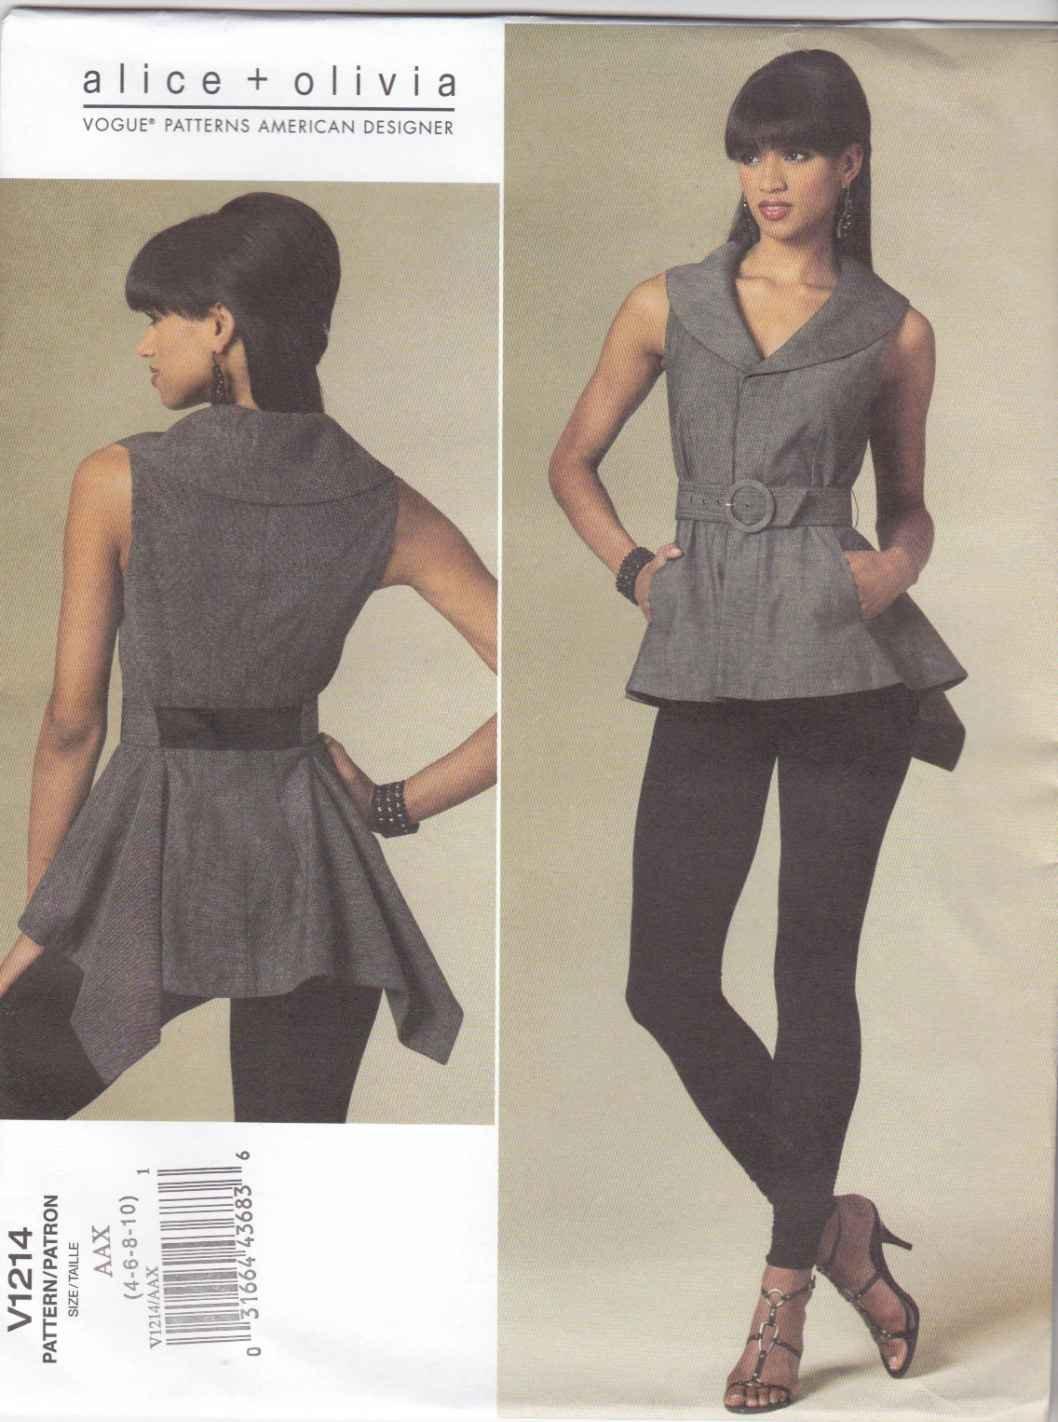 Vogue Sewing Pattern 1214 V1214 Misses Size 4-10 Alice & Olivia Sleeveless Top Belt Knit Leggings